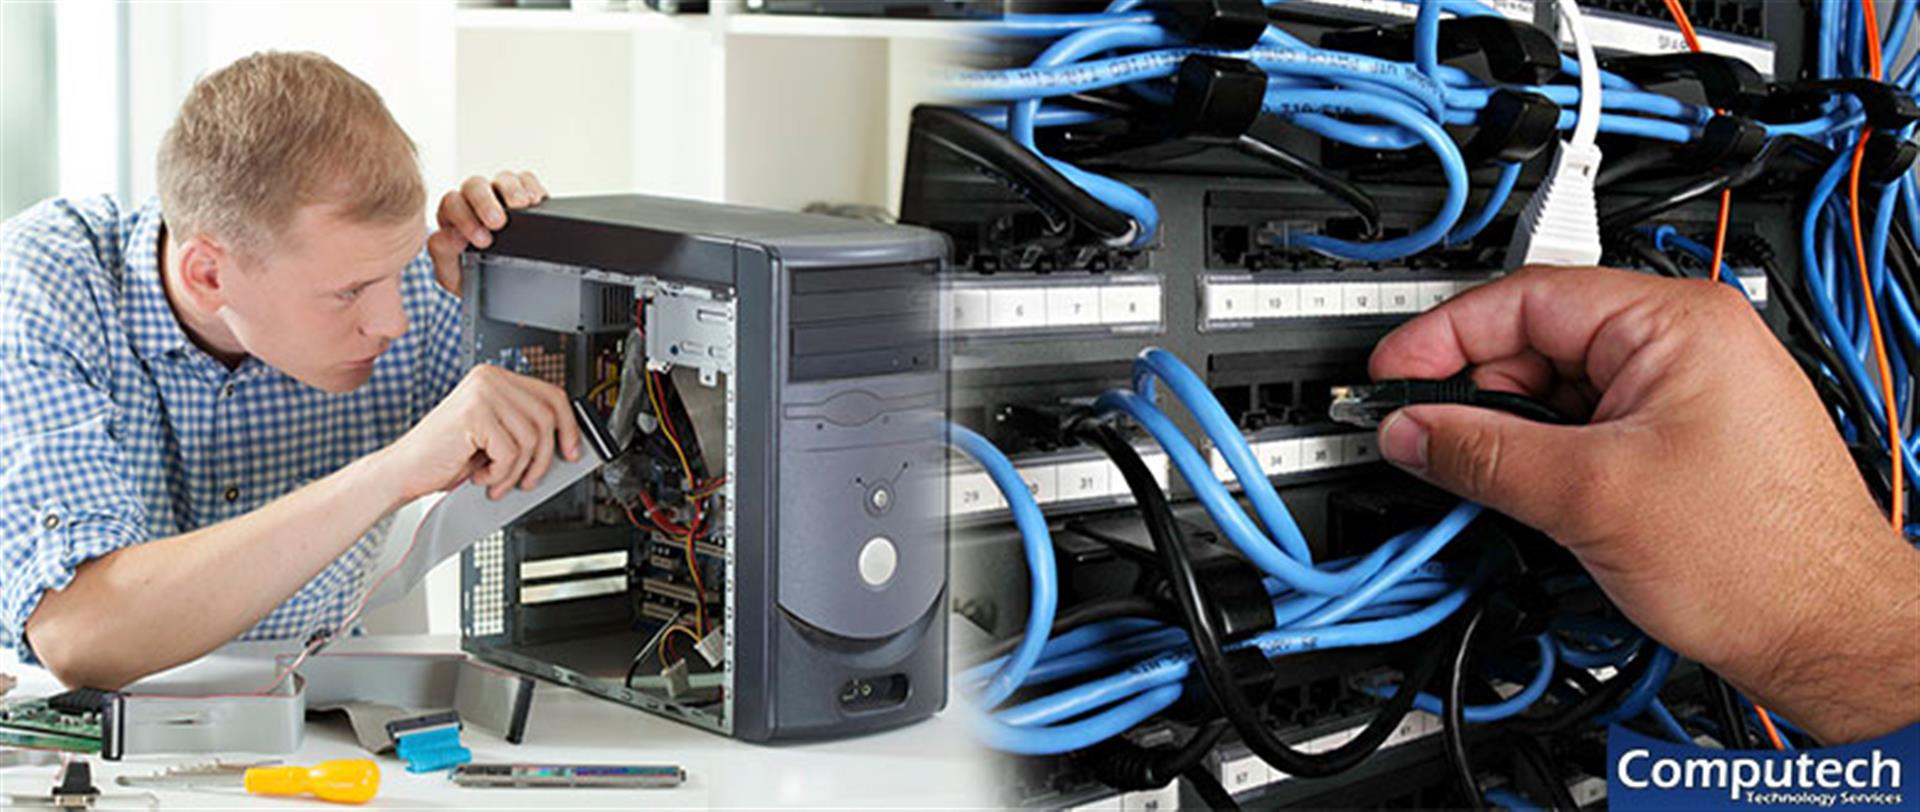 Jackson Alabama Onsite Computer & Printer Repairs, Network, Telecom & Data Inside Wiring Services